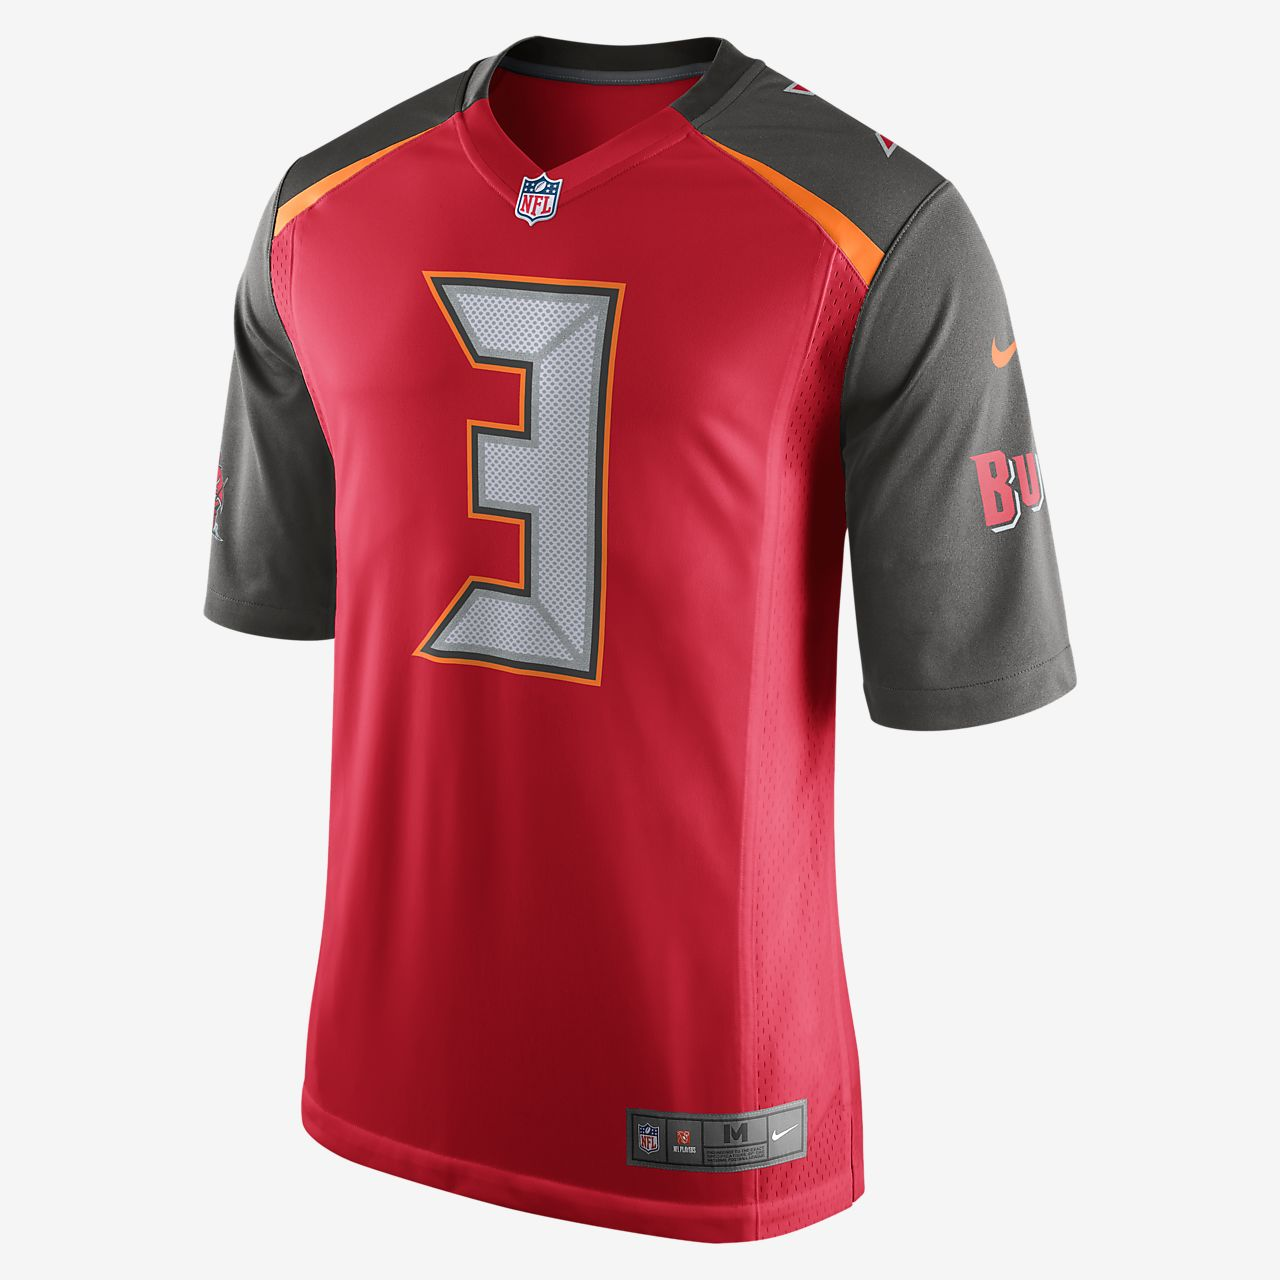 NFL Tampa Bay Buccaneers (Jameis Winston) hjemmedrakt for amerikansk fotball for herre